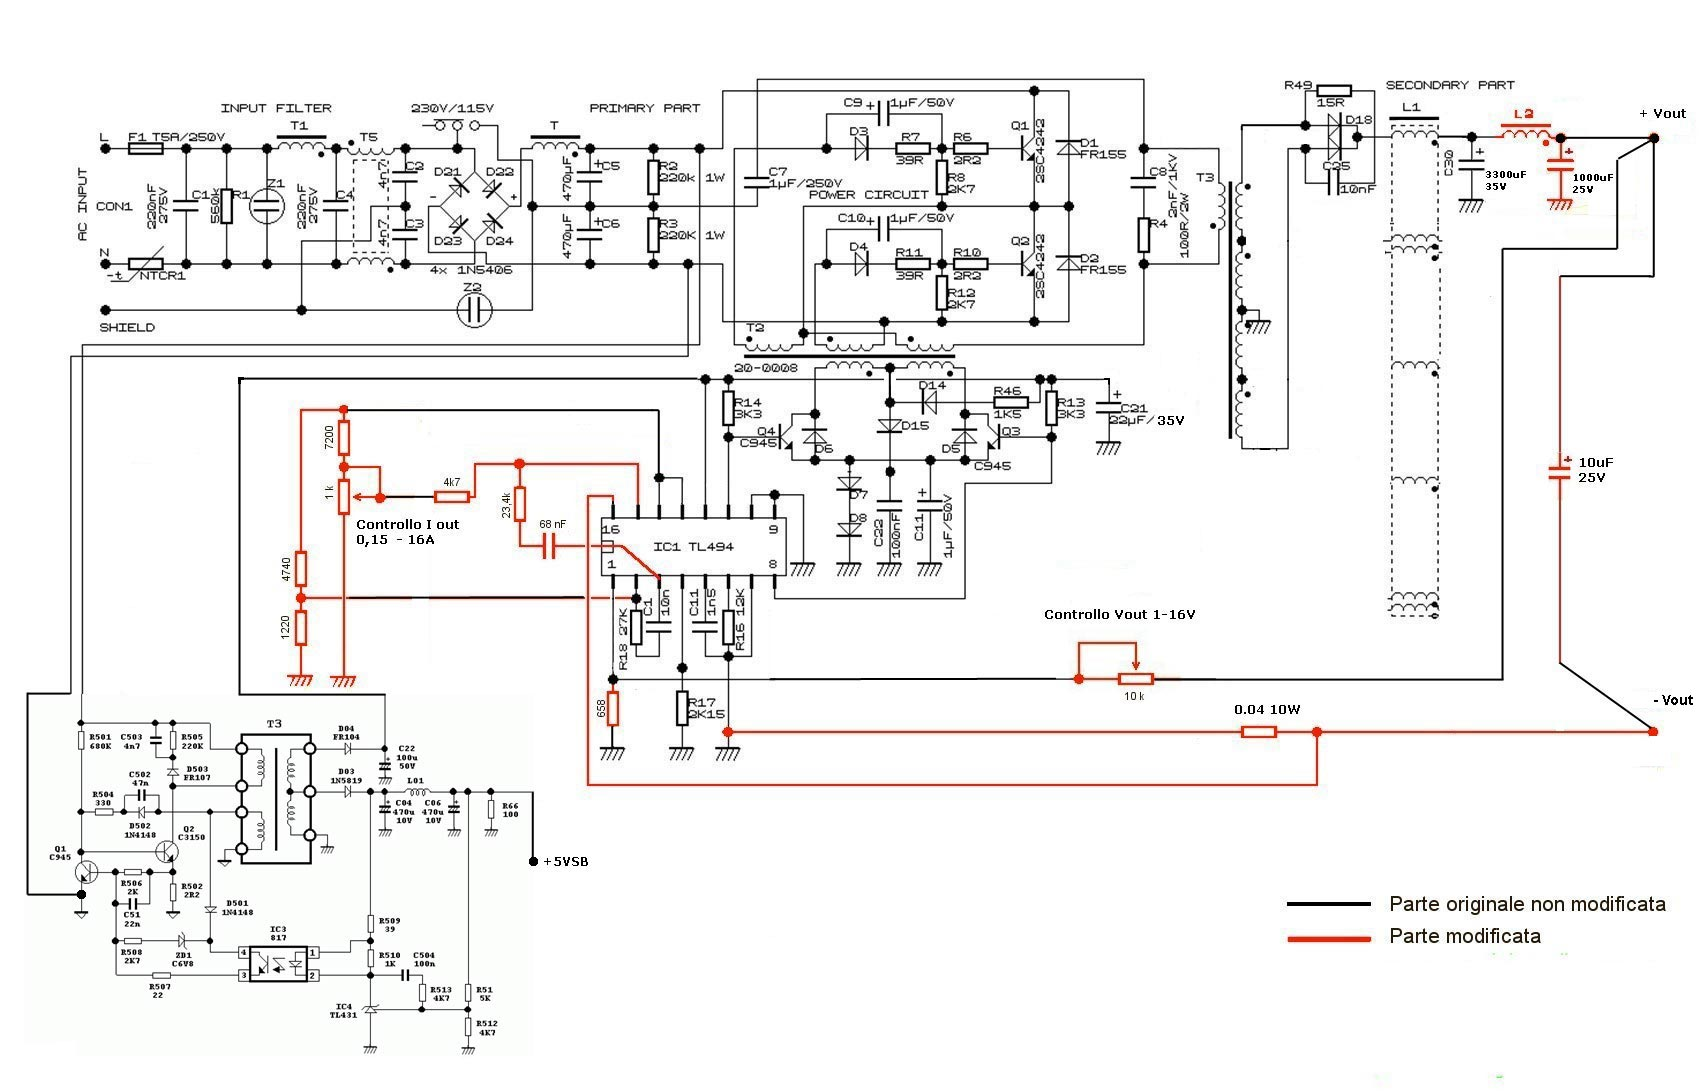 Voltage Regulator With Constant Current Limiting Schematicrev4